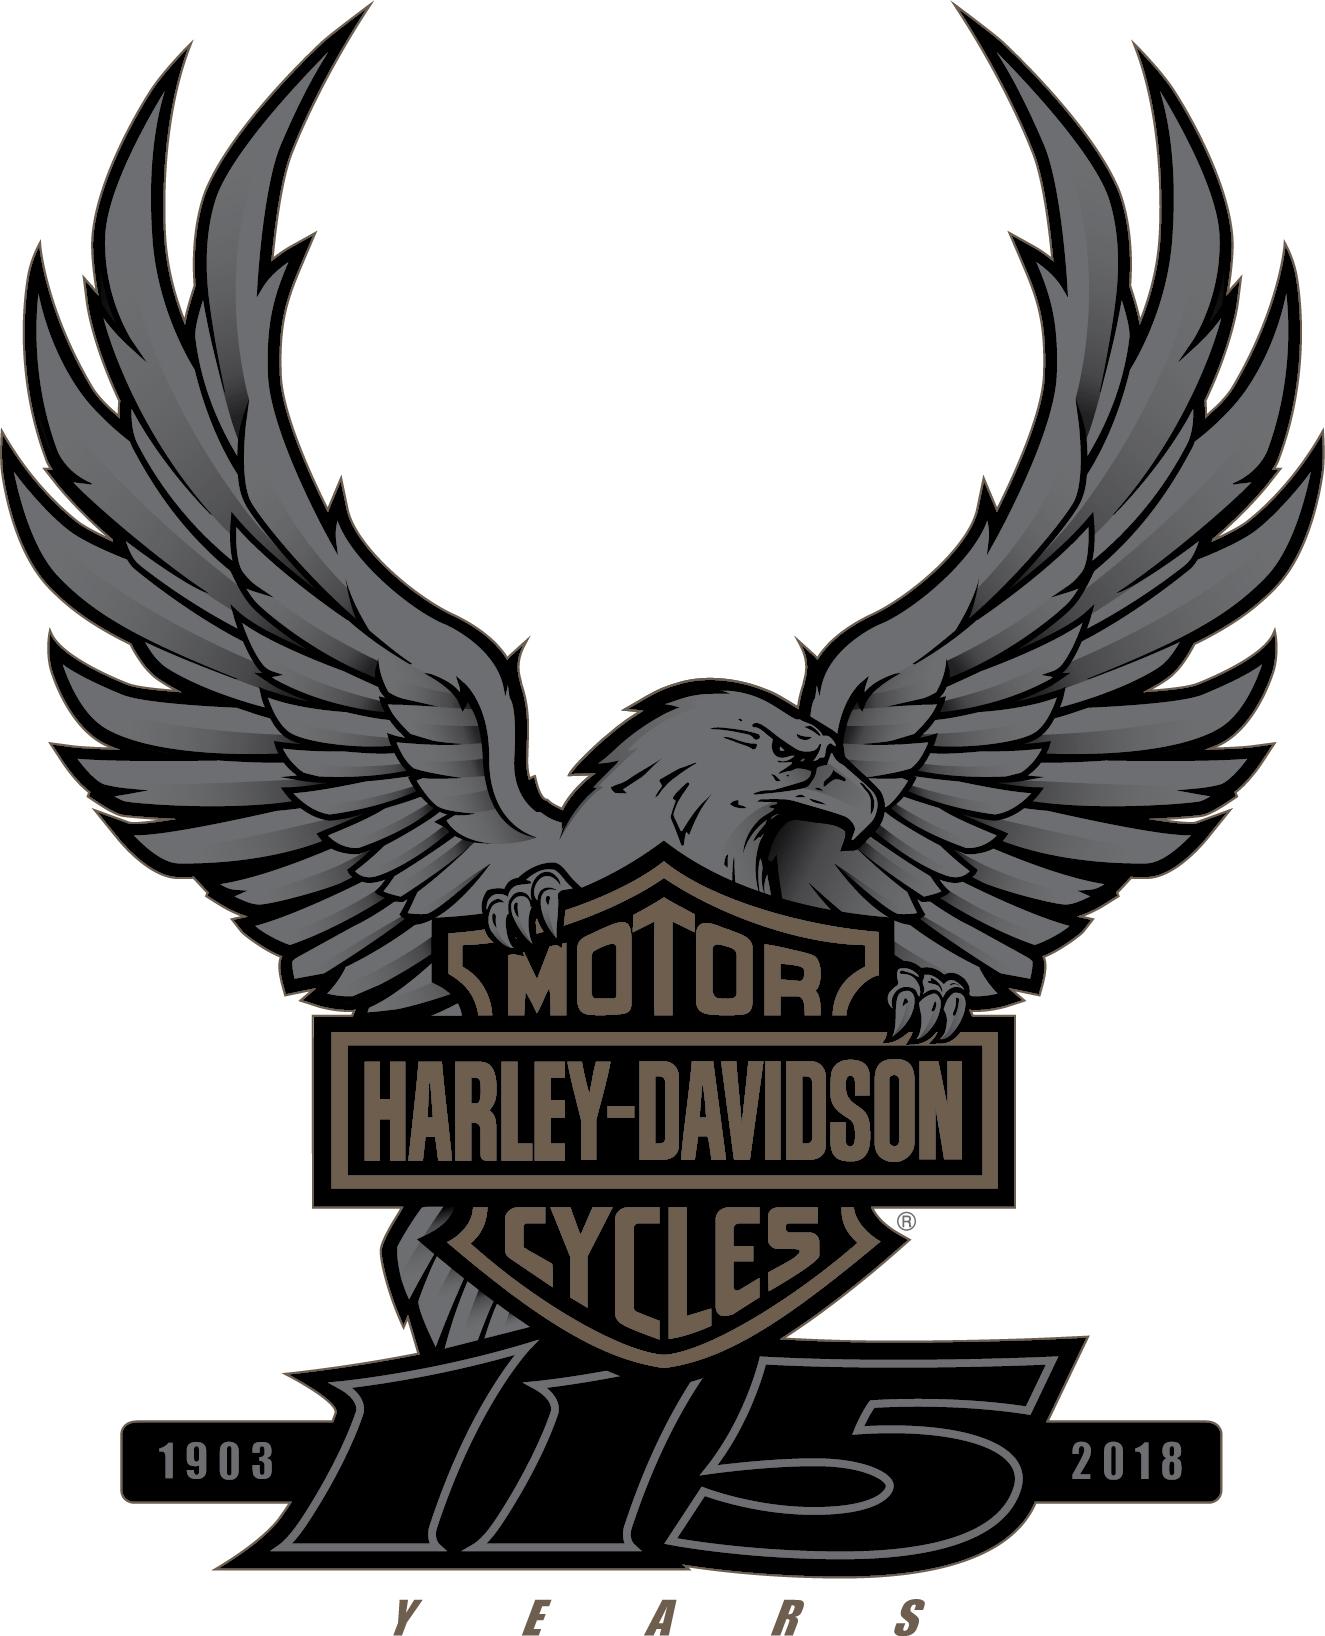 Harley Davidson Announces 115th Anniversary Celebration